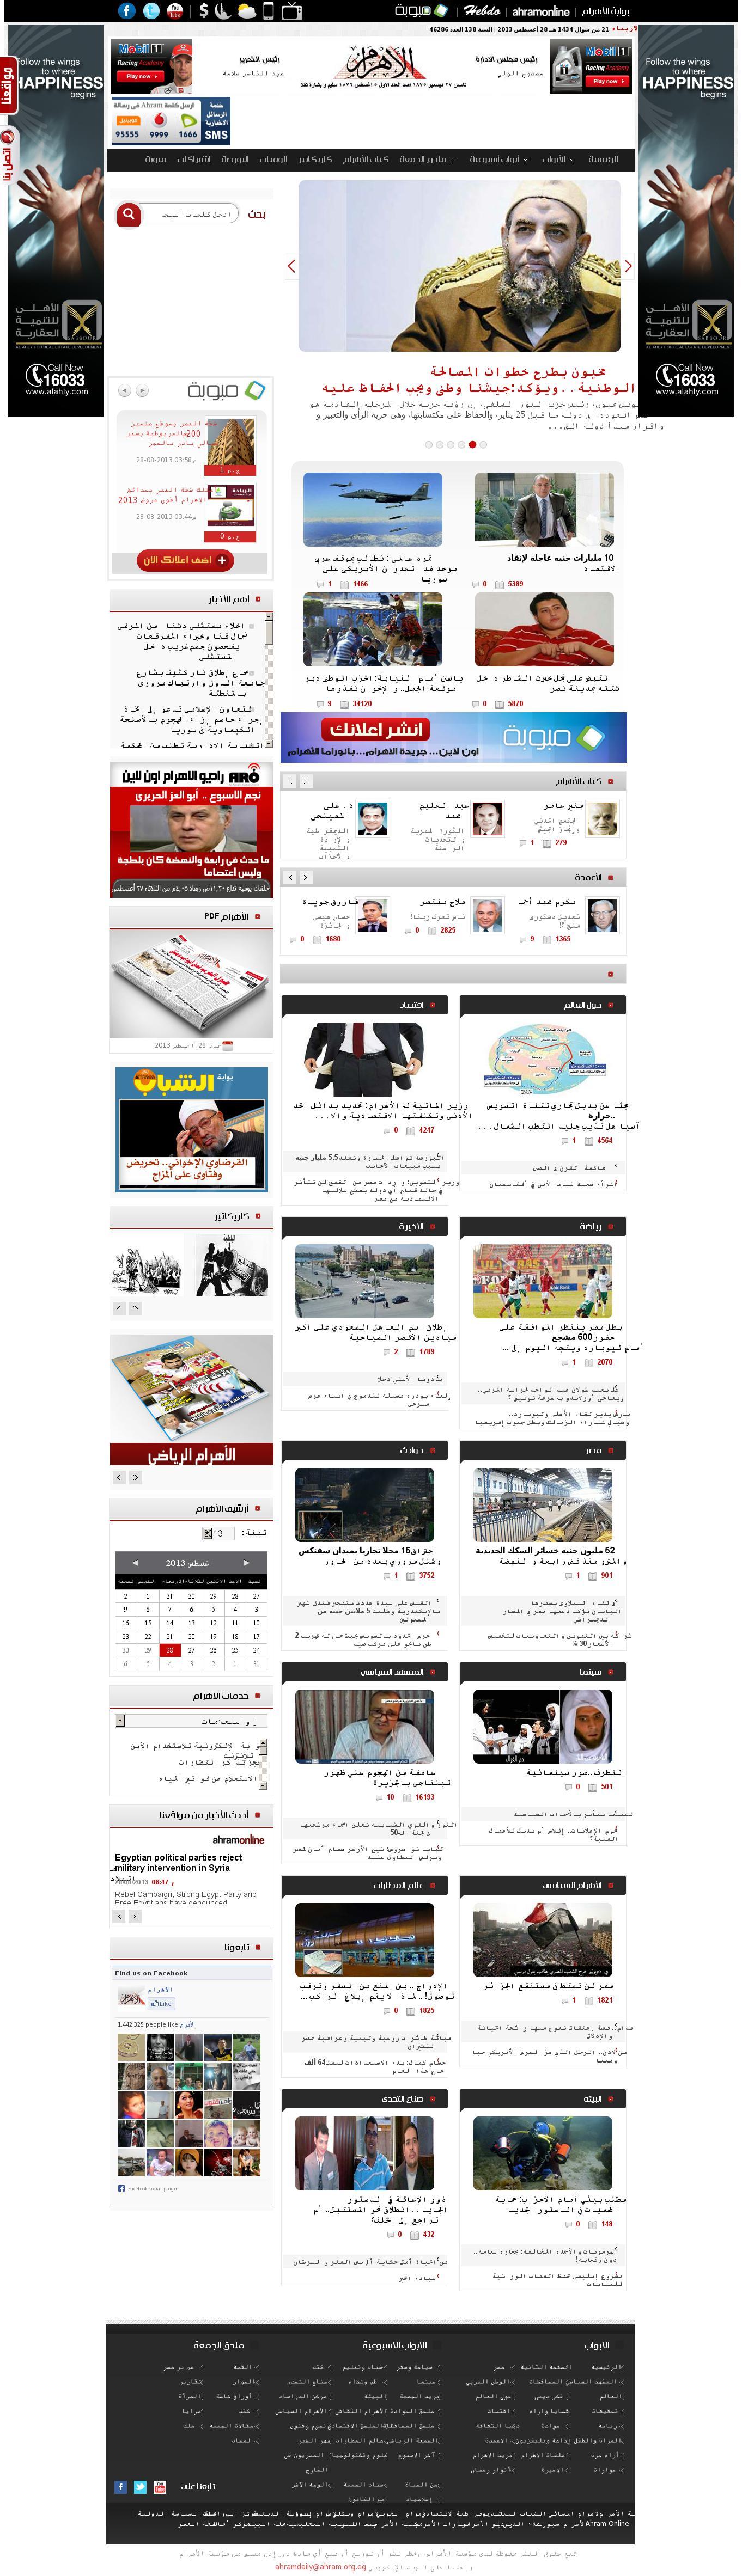 Al-Ahram at Wednesday Aug. 28, 2013, 9 p.m. UTC